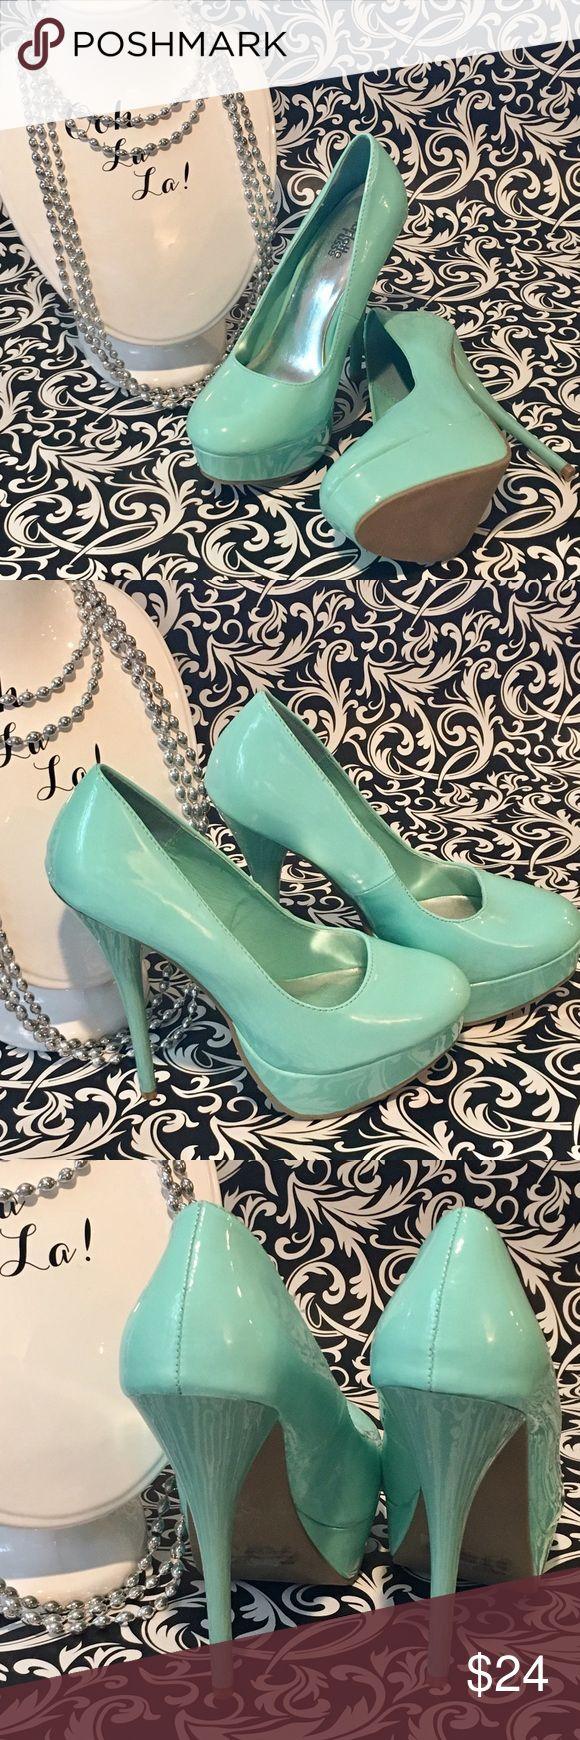 "Charlotte Russe aqua platform heels Charlotte Russe aqua platform heels, size 7. 5-1/2"" heel, 1"" platform Charlotte Russe Shoes Heels"